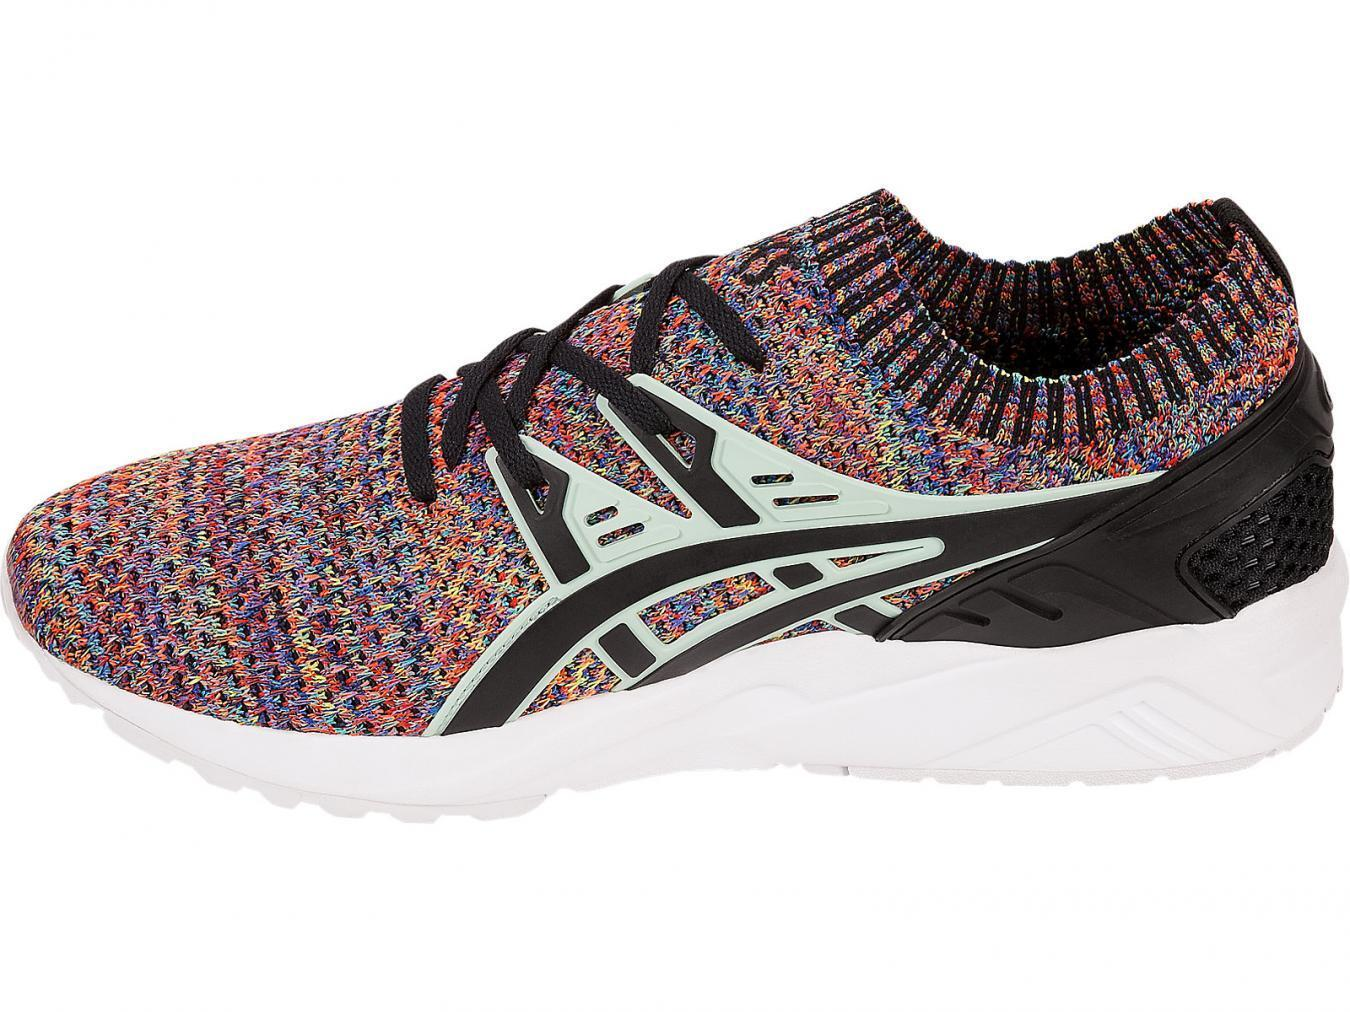 NEW ASICS Tiger Gel Keyano Knit Running Shoe Multi Color HN7Q-9067 Men SZ 9. 5